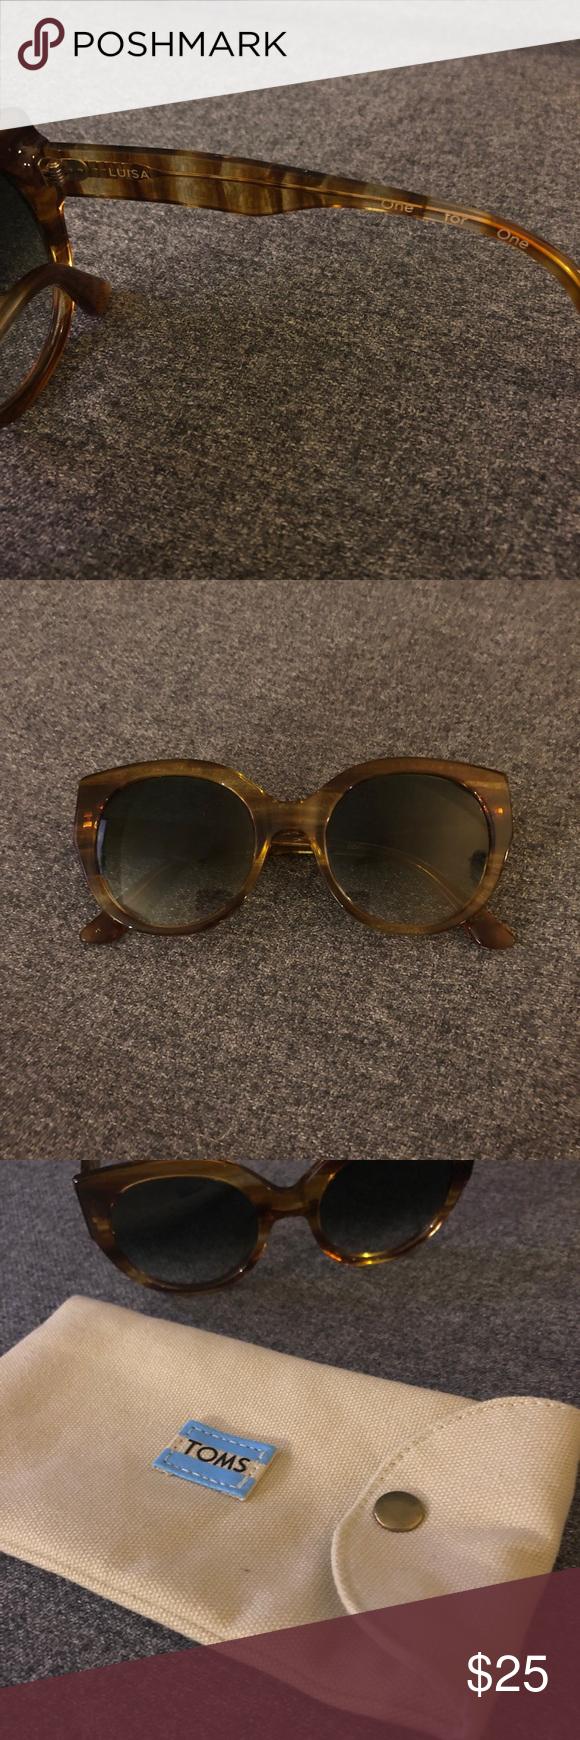 8bdce31d8f8fa TOMS Luisa cat-eye sunglasses Great tortoise look